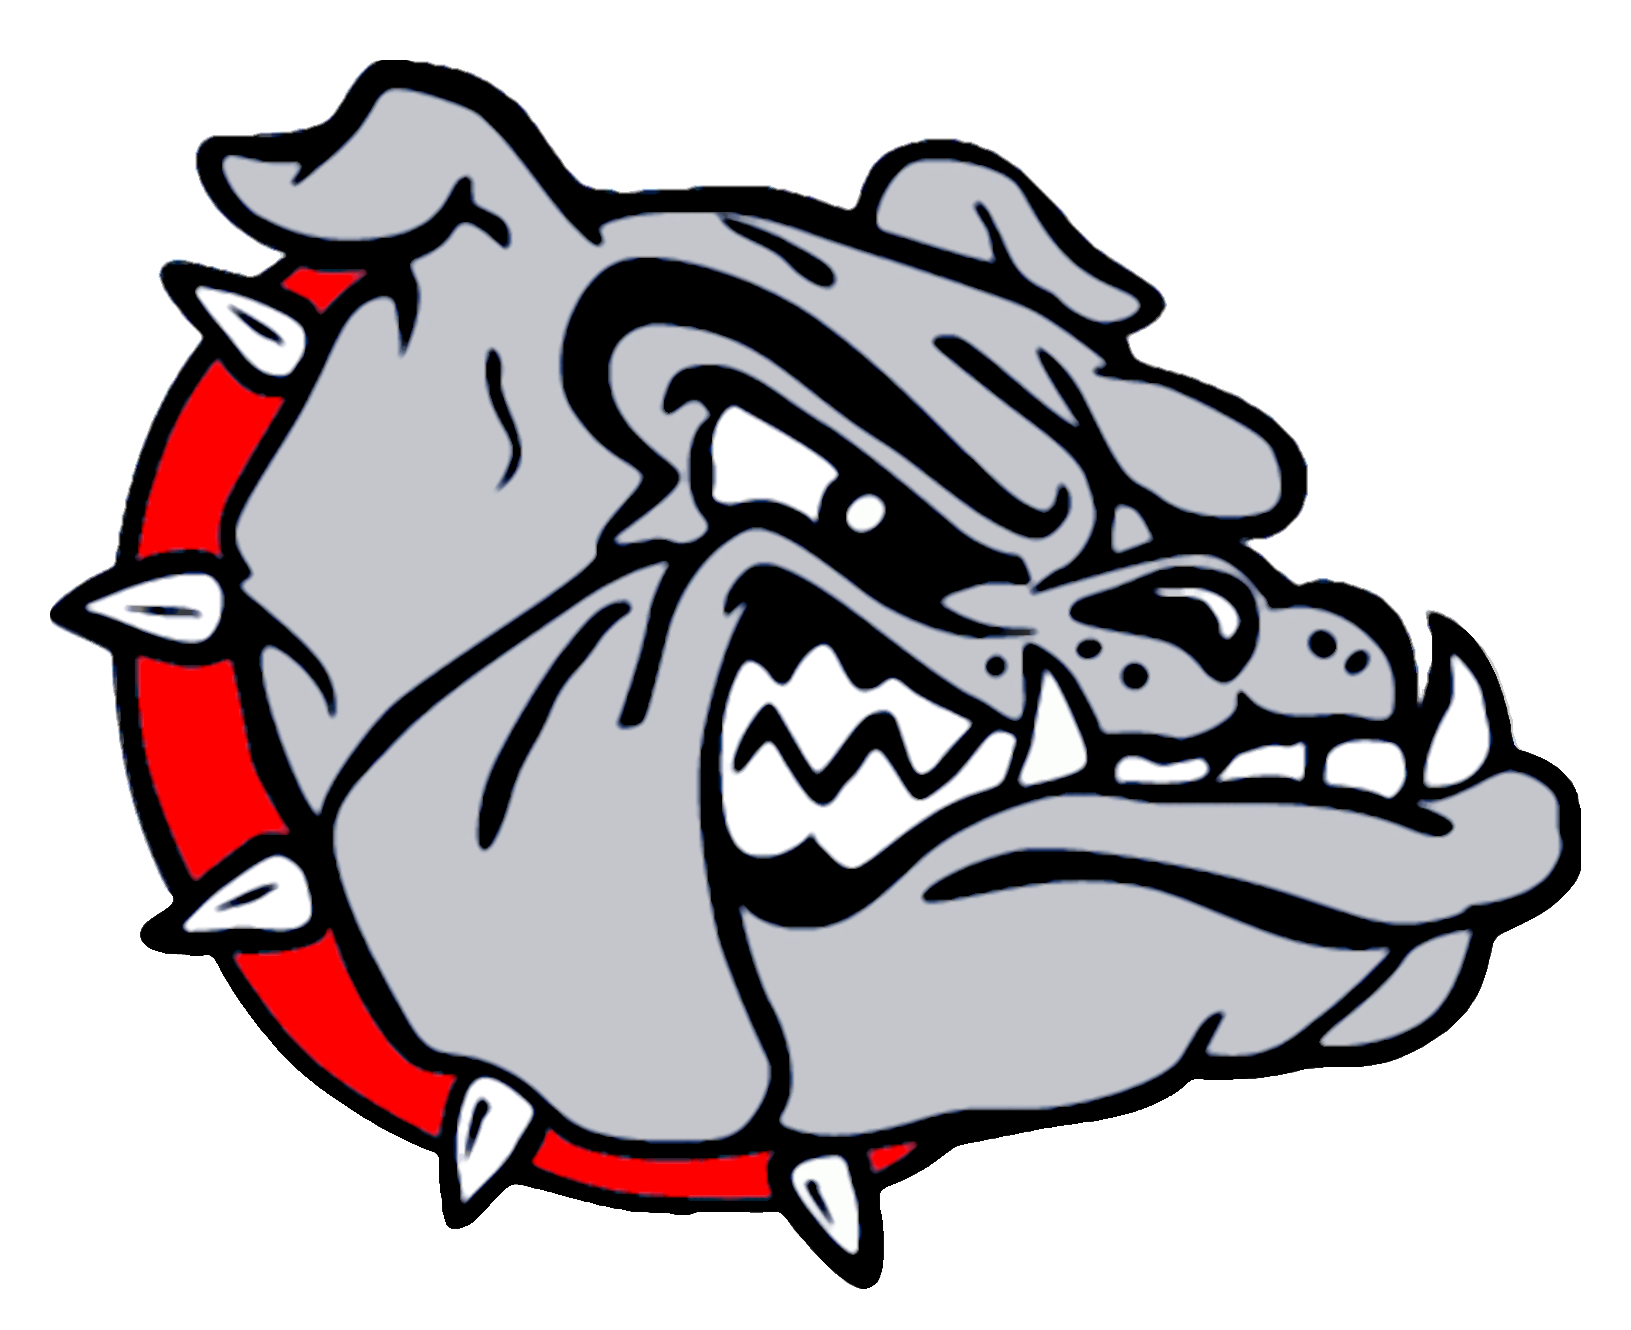 Bulldog mascots shared by. Wrestlers clipart mascot